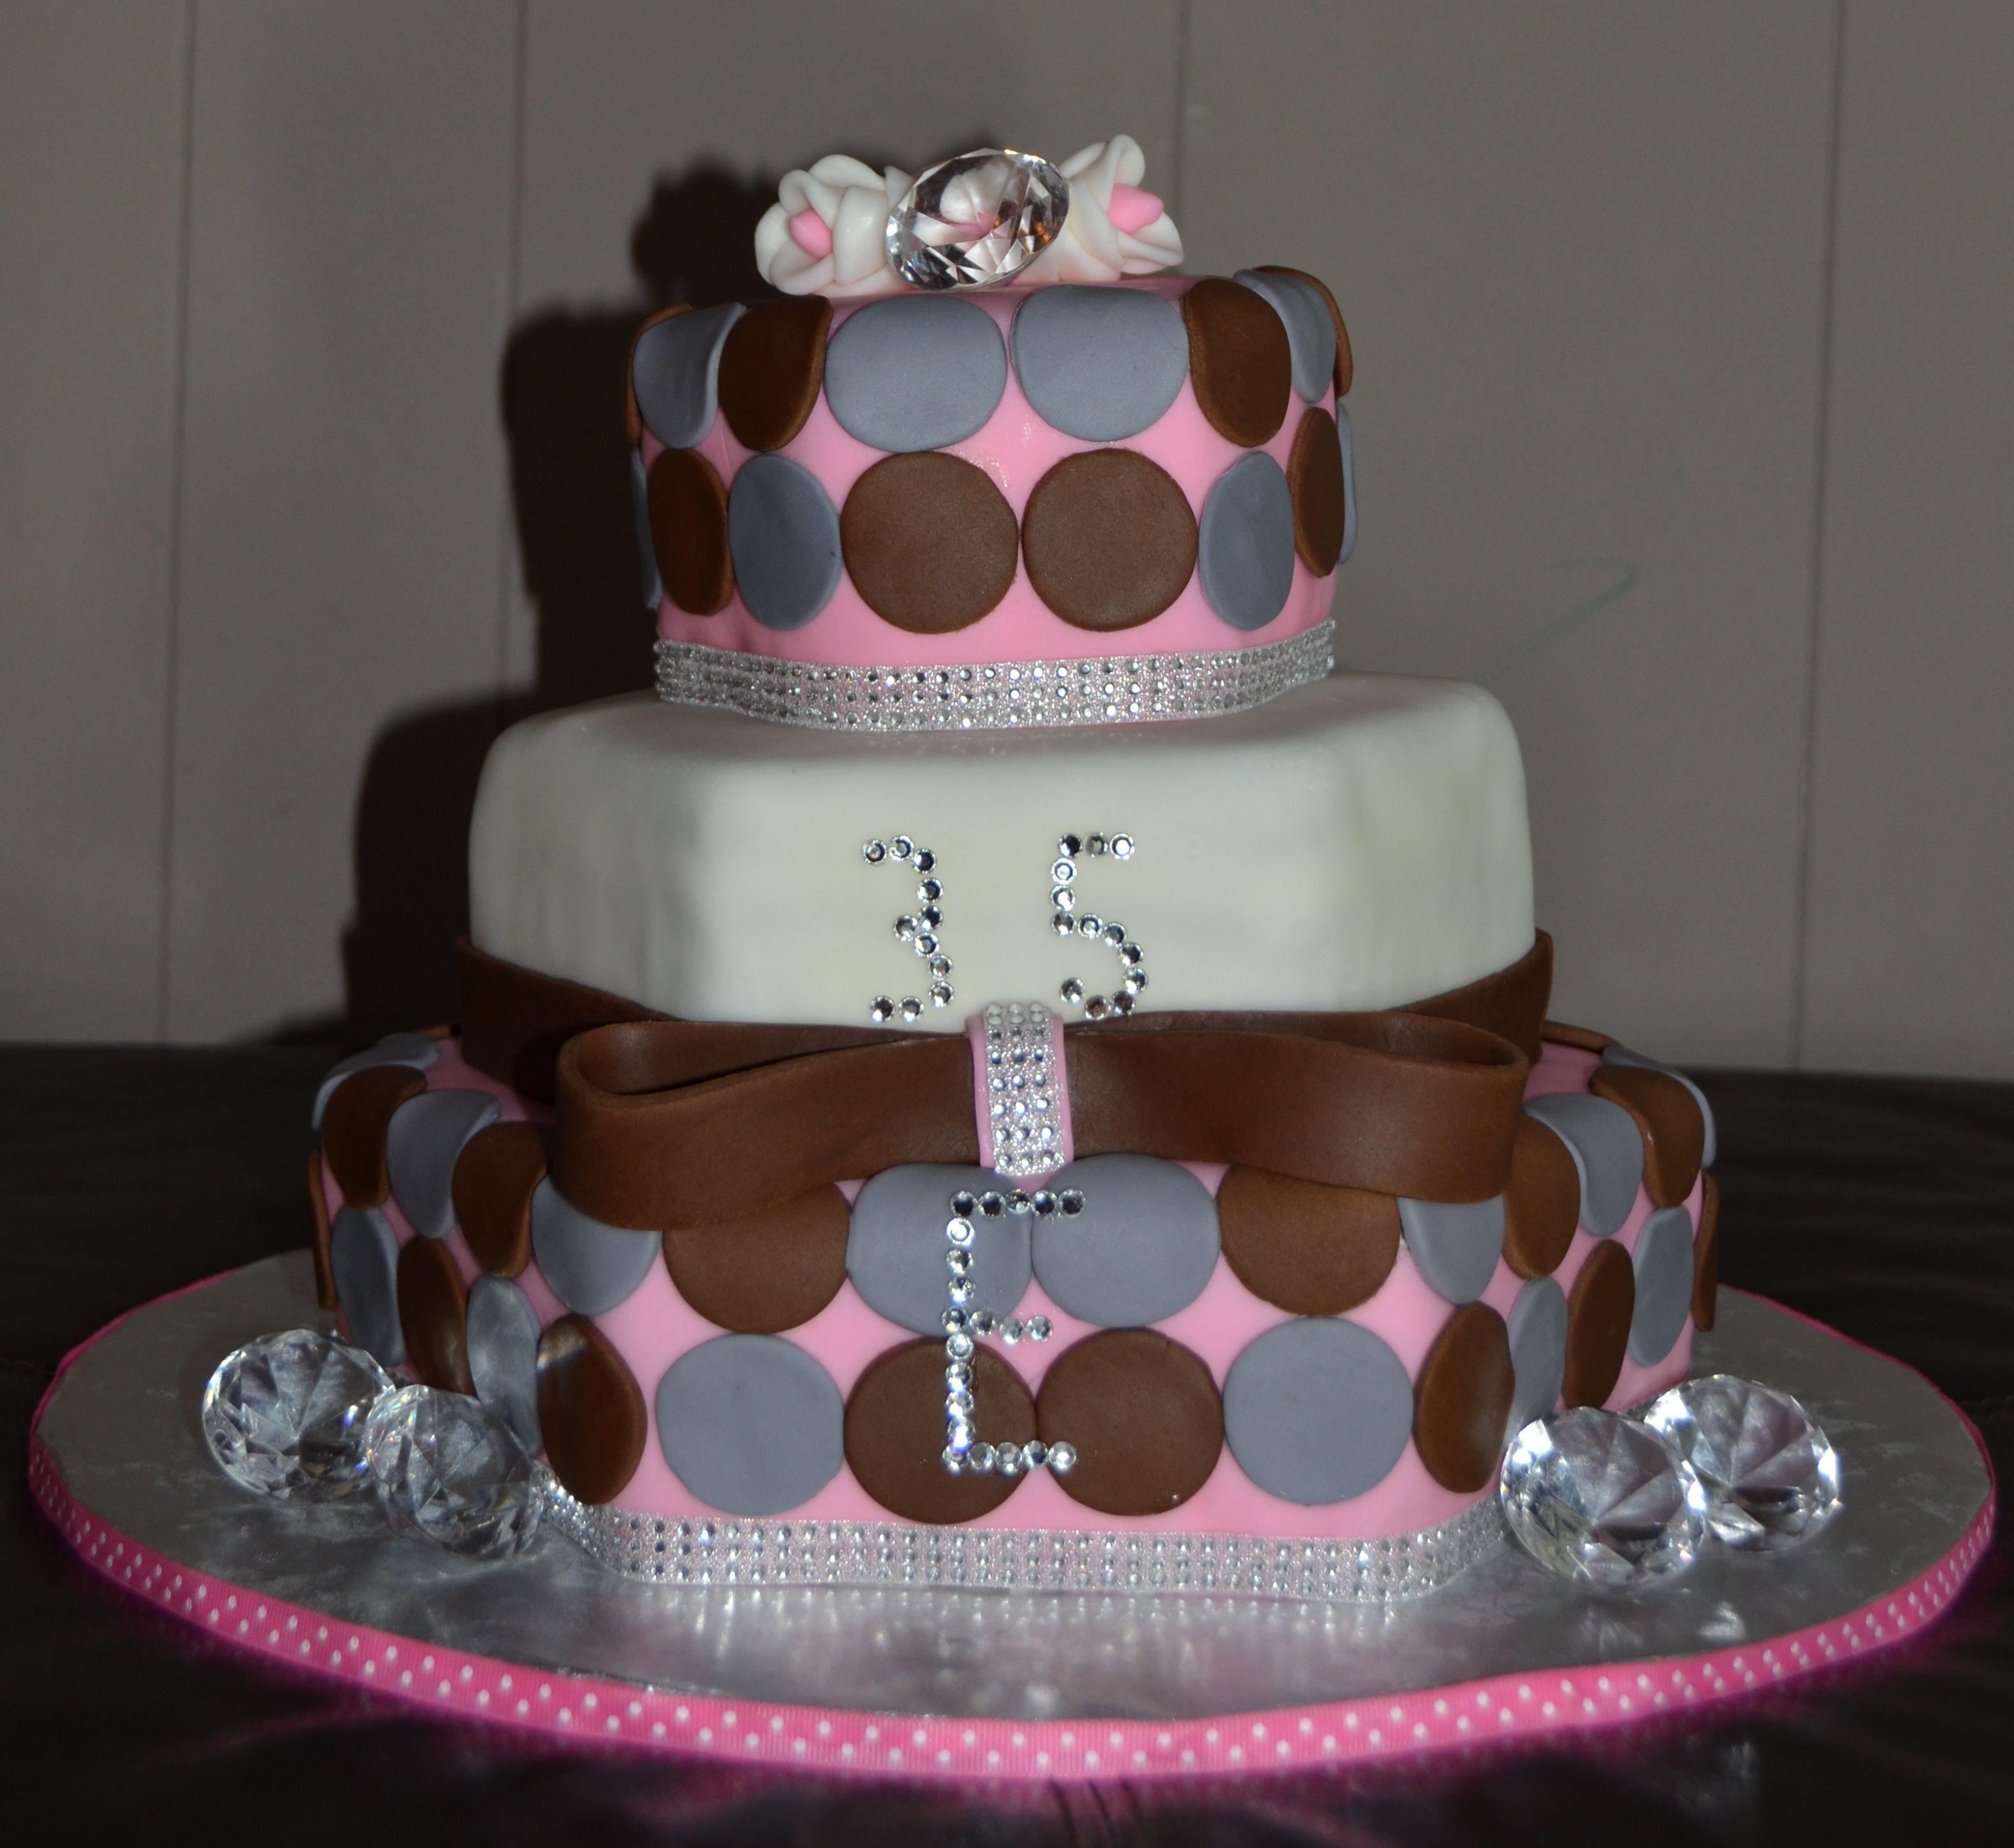 Th Birthday Cake With Diamond Accents Designs CAKES - 35th birthday cake ideas